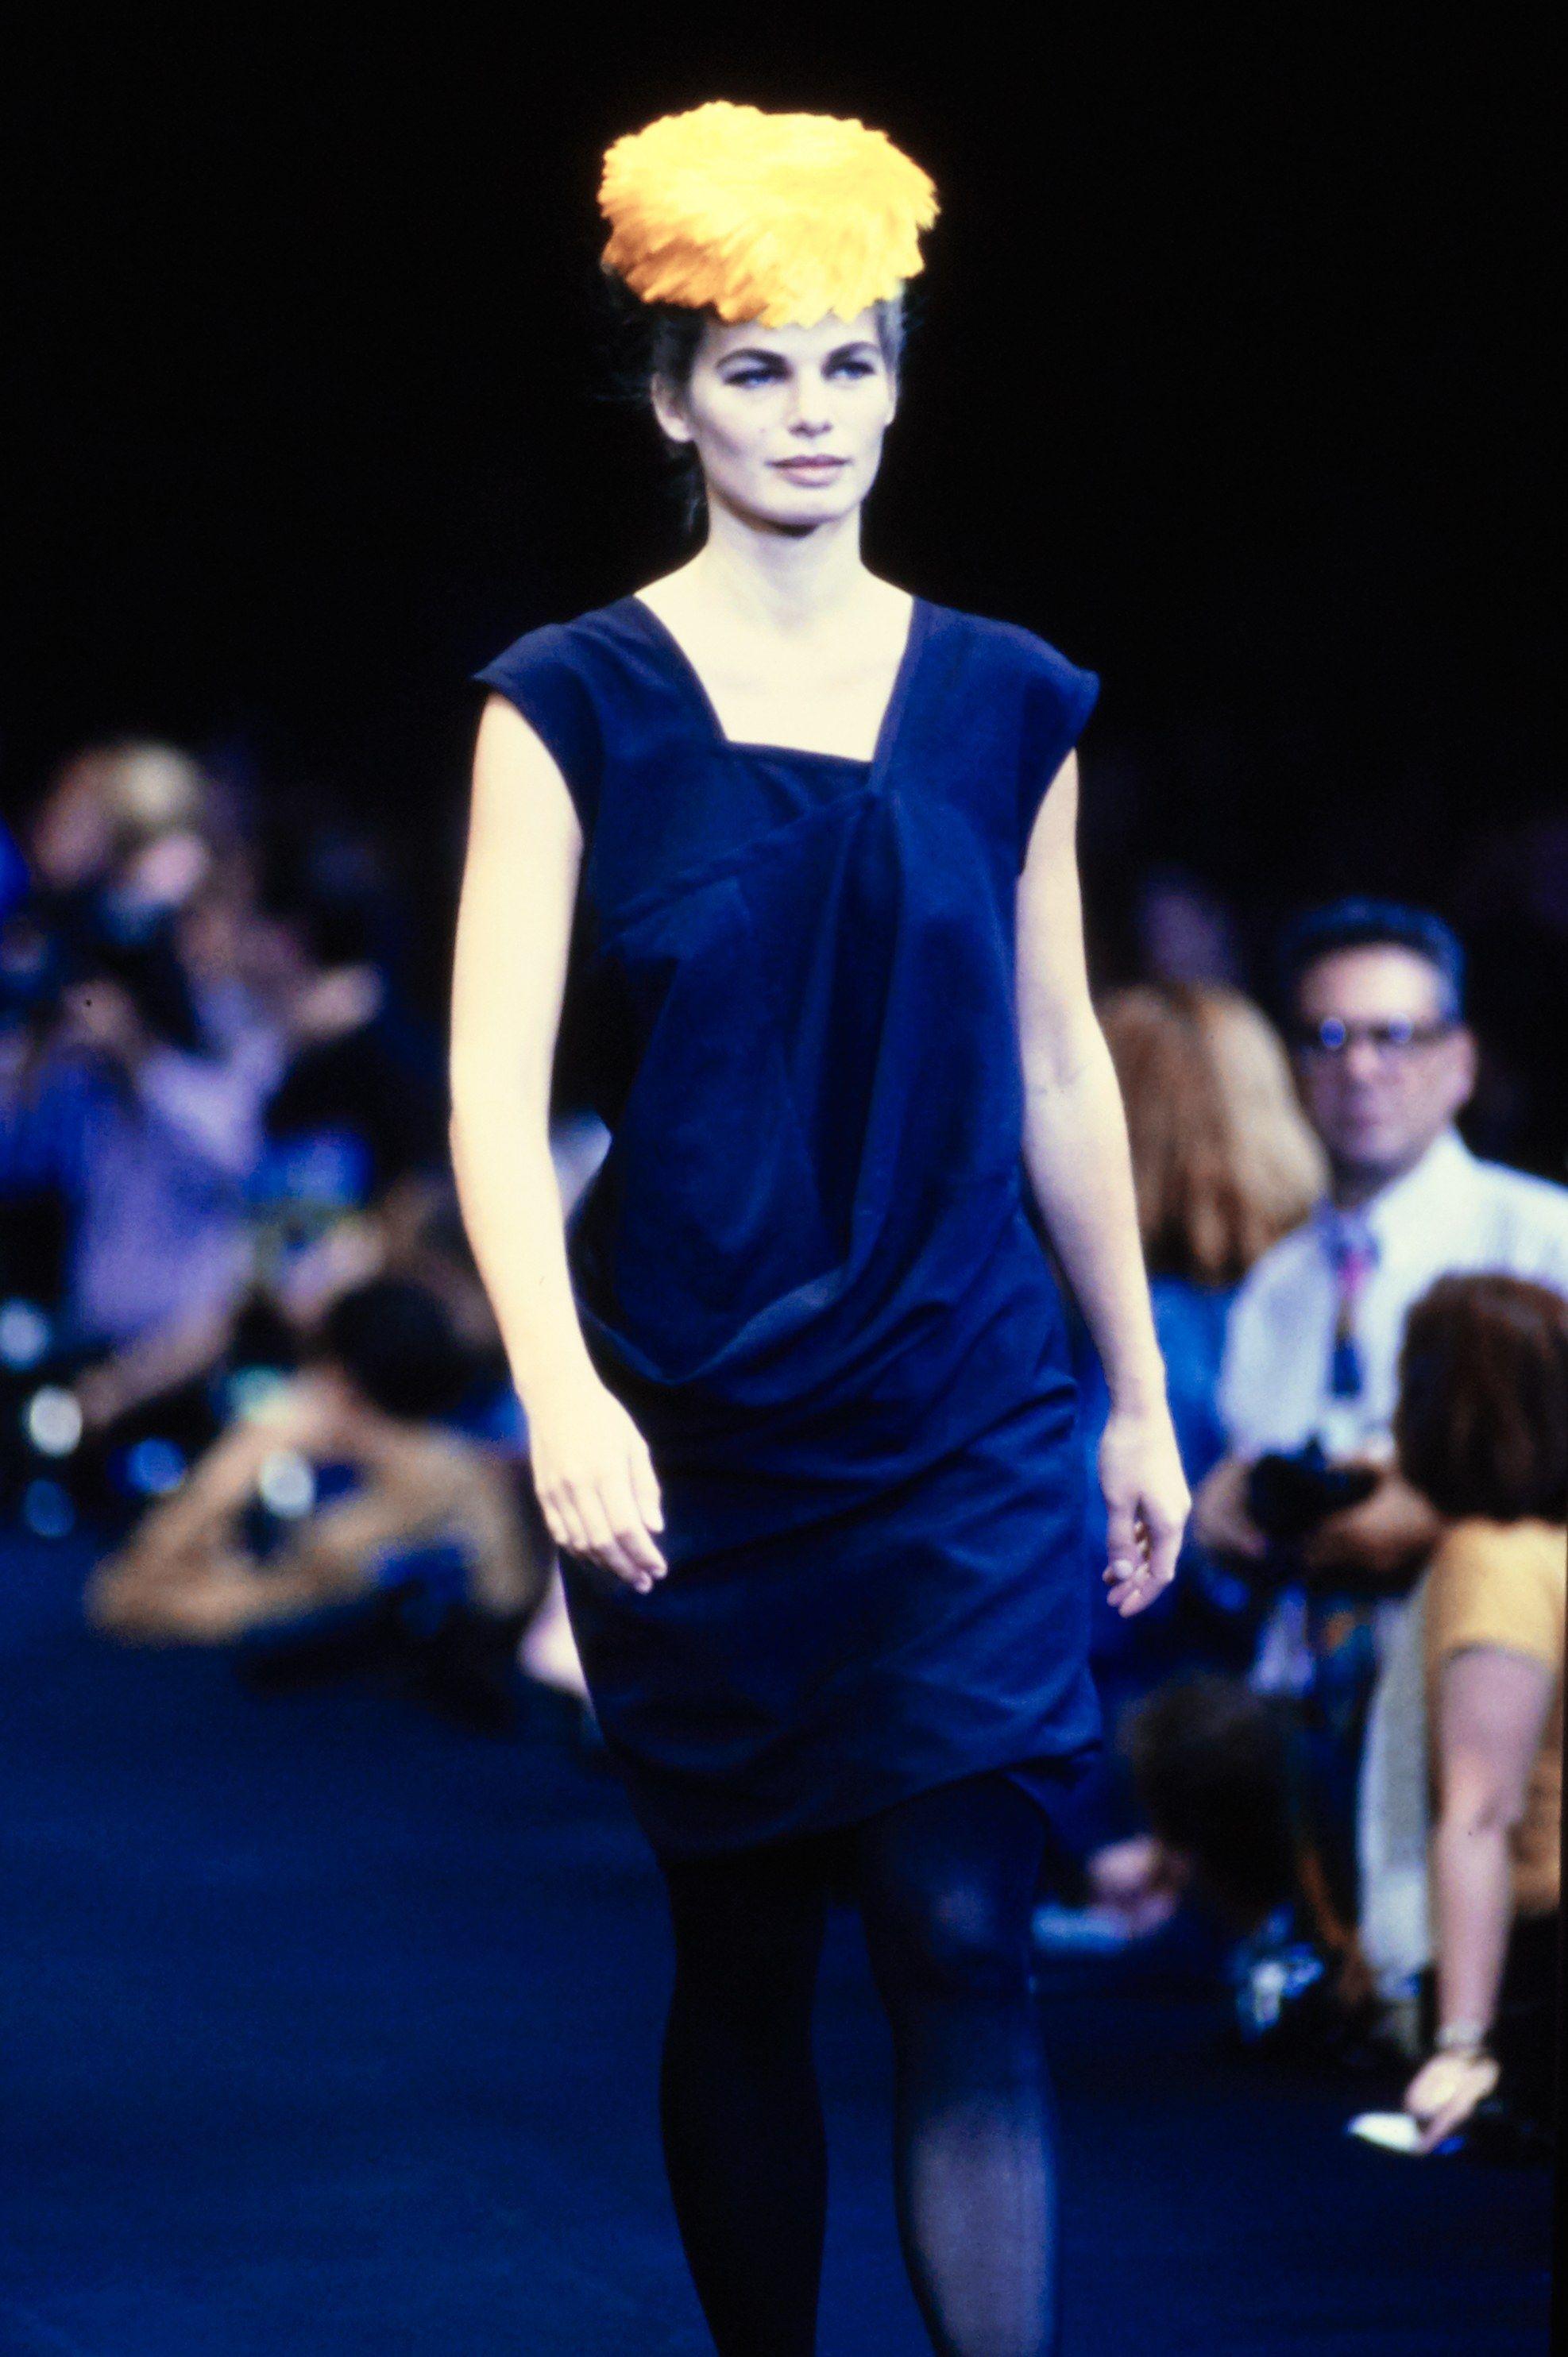 9b05d01b664990 Comme des Garçons Spring 1991 Ready-to-Wear Fashion Show - Cordula Reyer